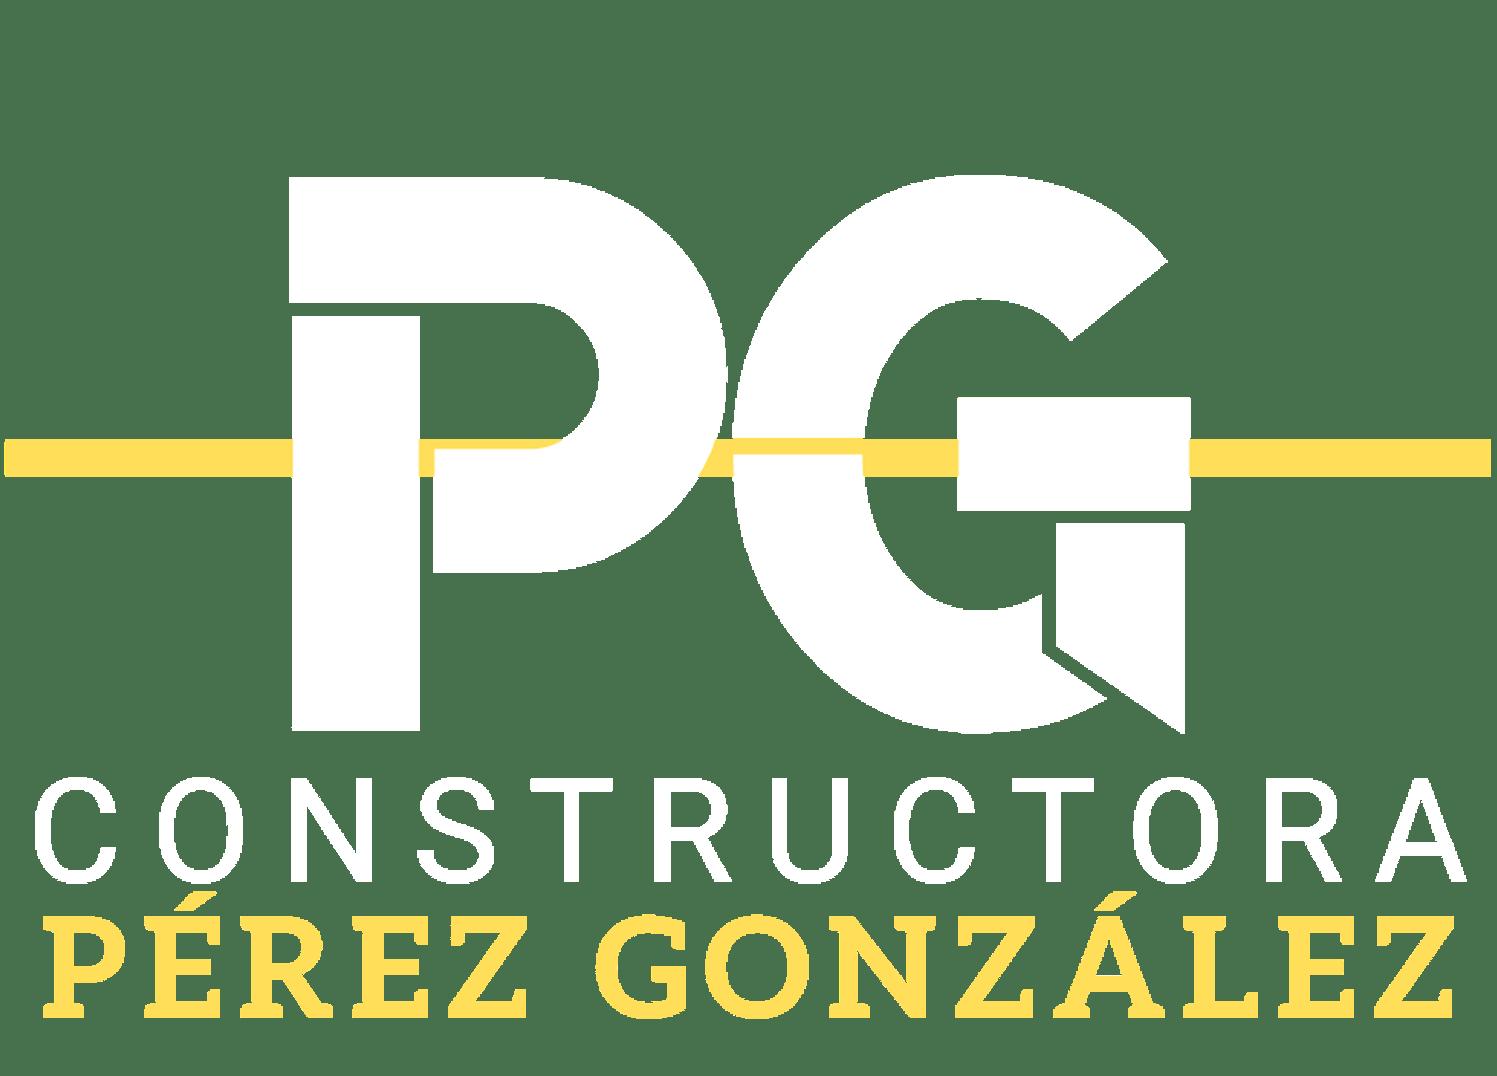 Constructora Perez Gonzalez